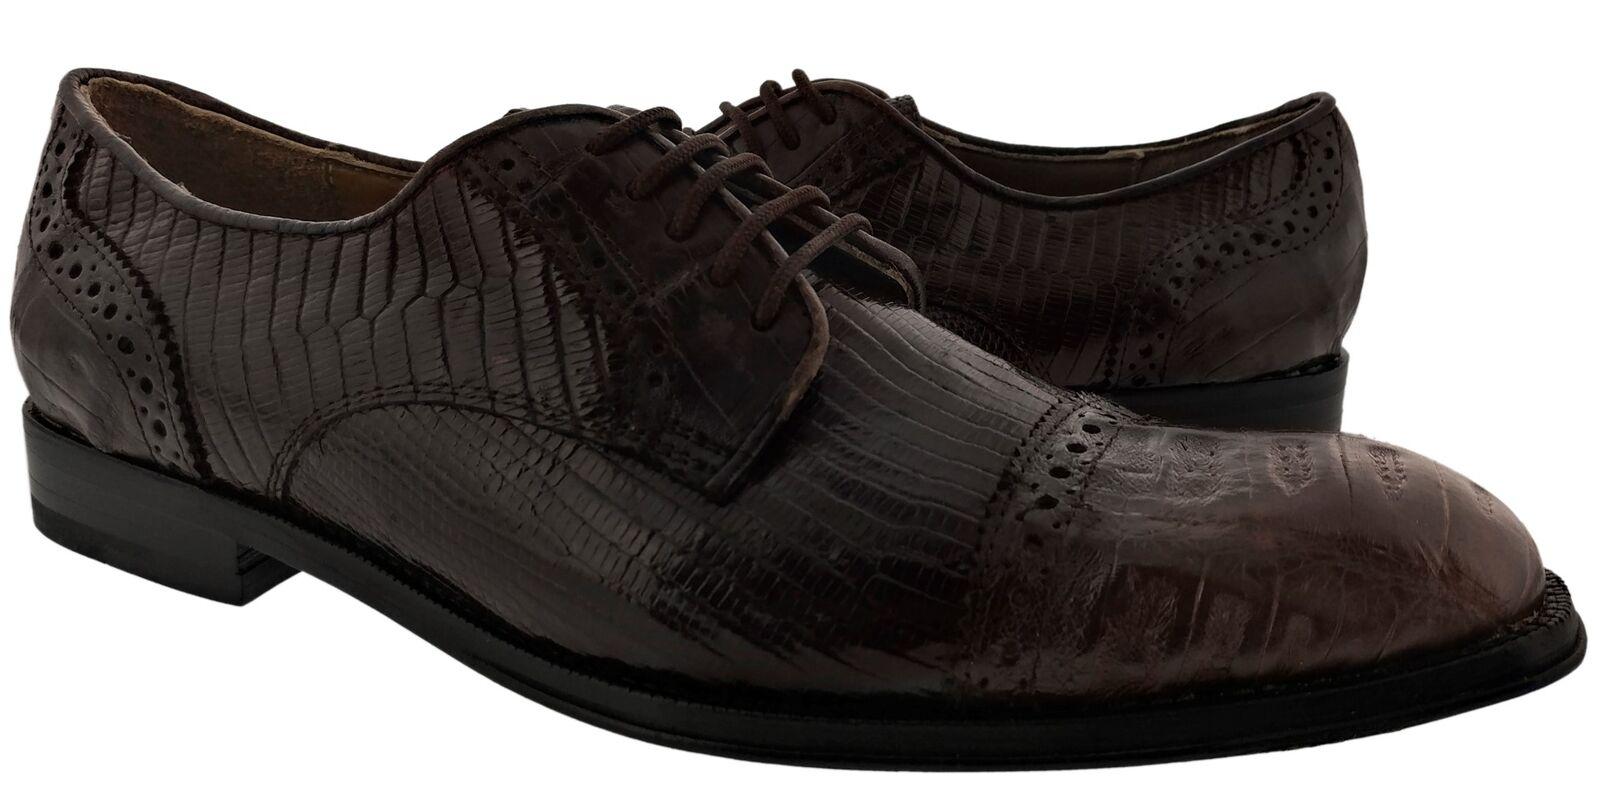 Uomo Brown Genuine Lizard Exotic Crocodile Exotic Dress Shoes Oxford